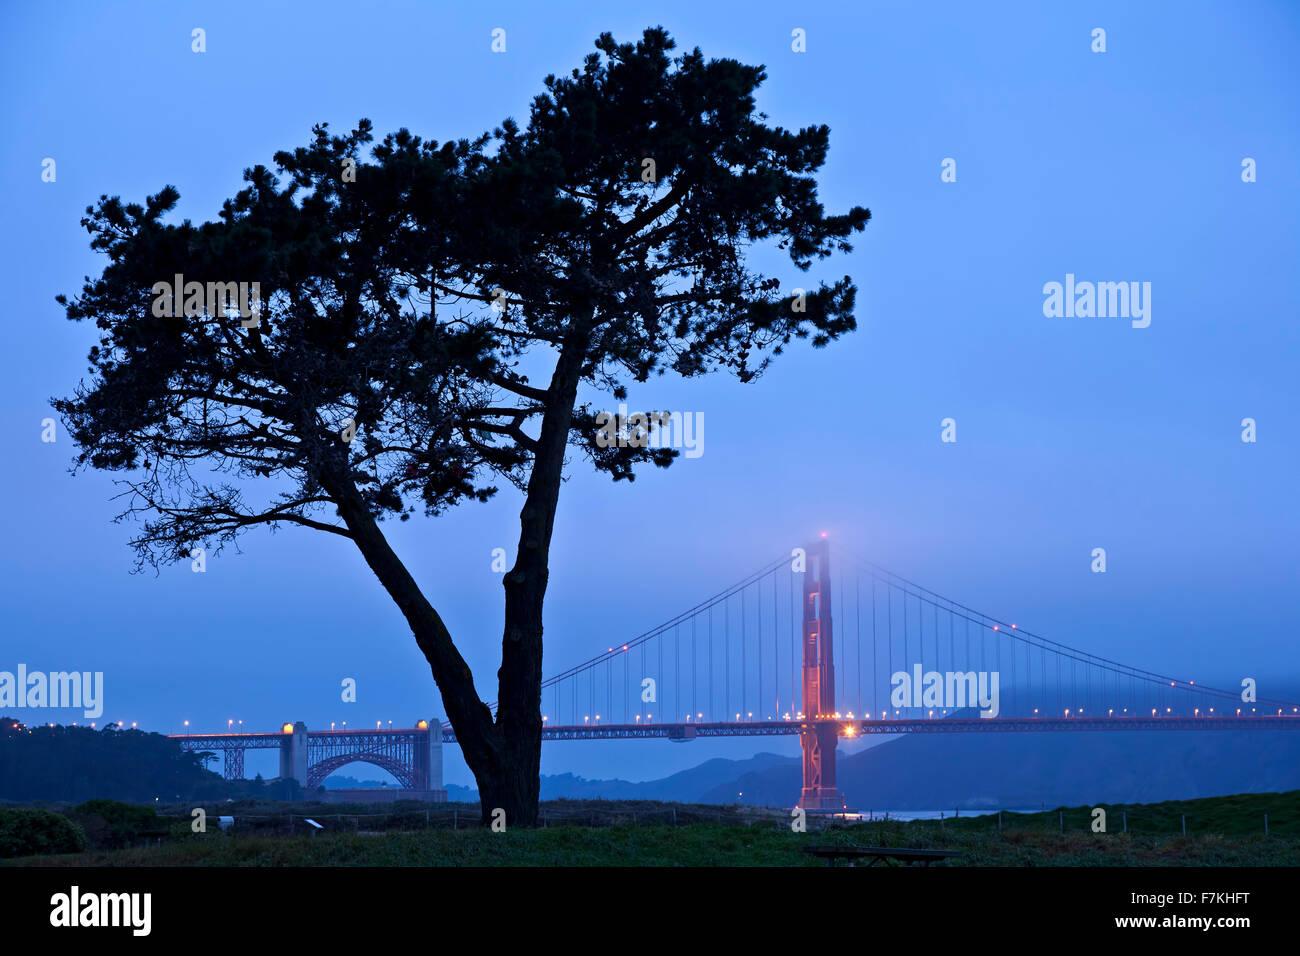 Arbre et Golden Gate Bridge dans le brouillard, San Francisco, California USA Photo Stock